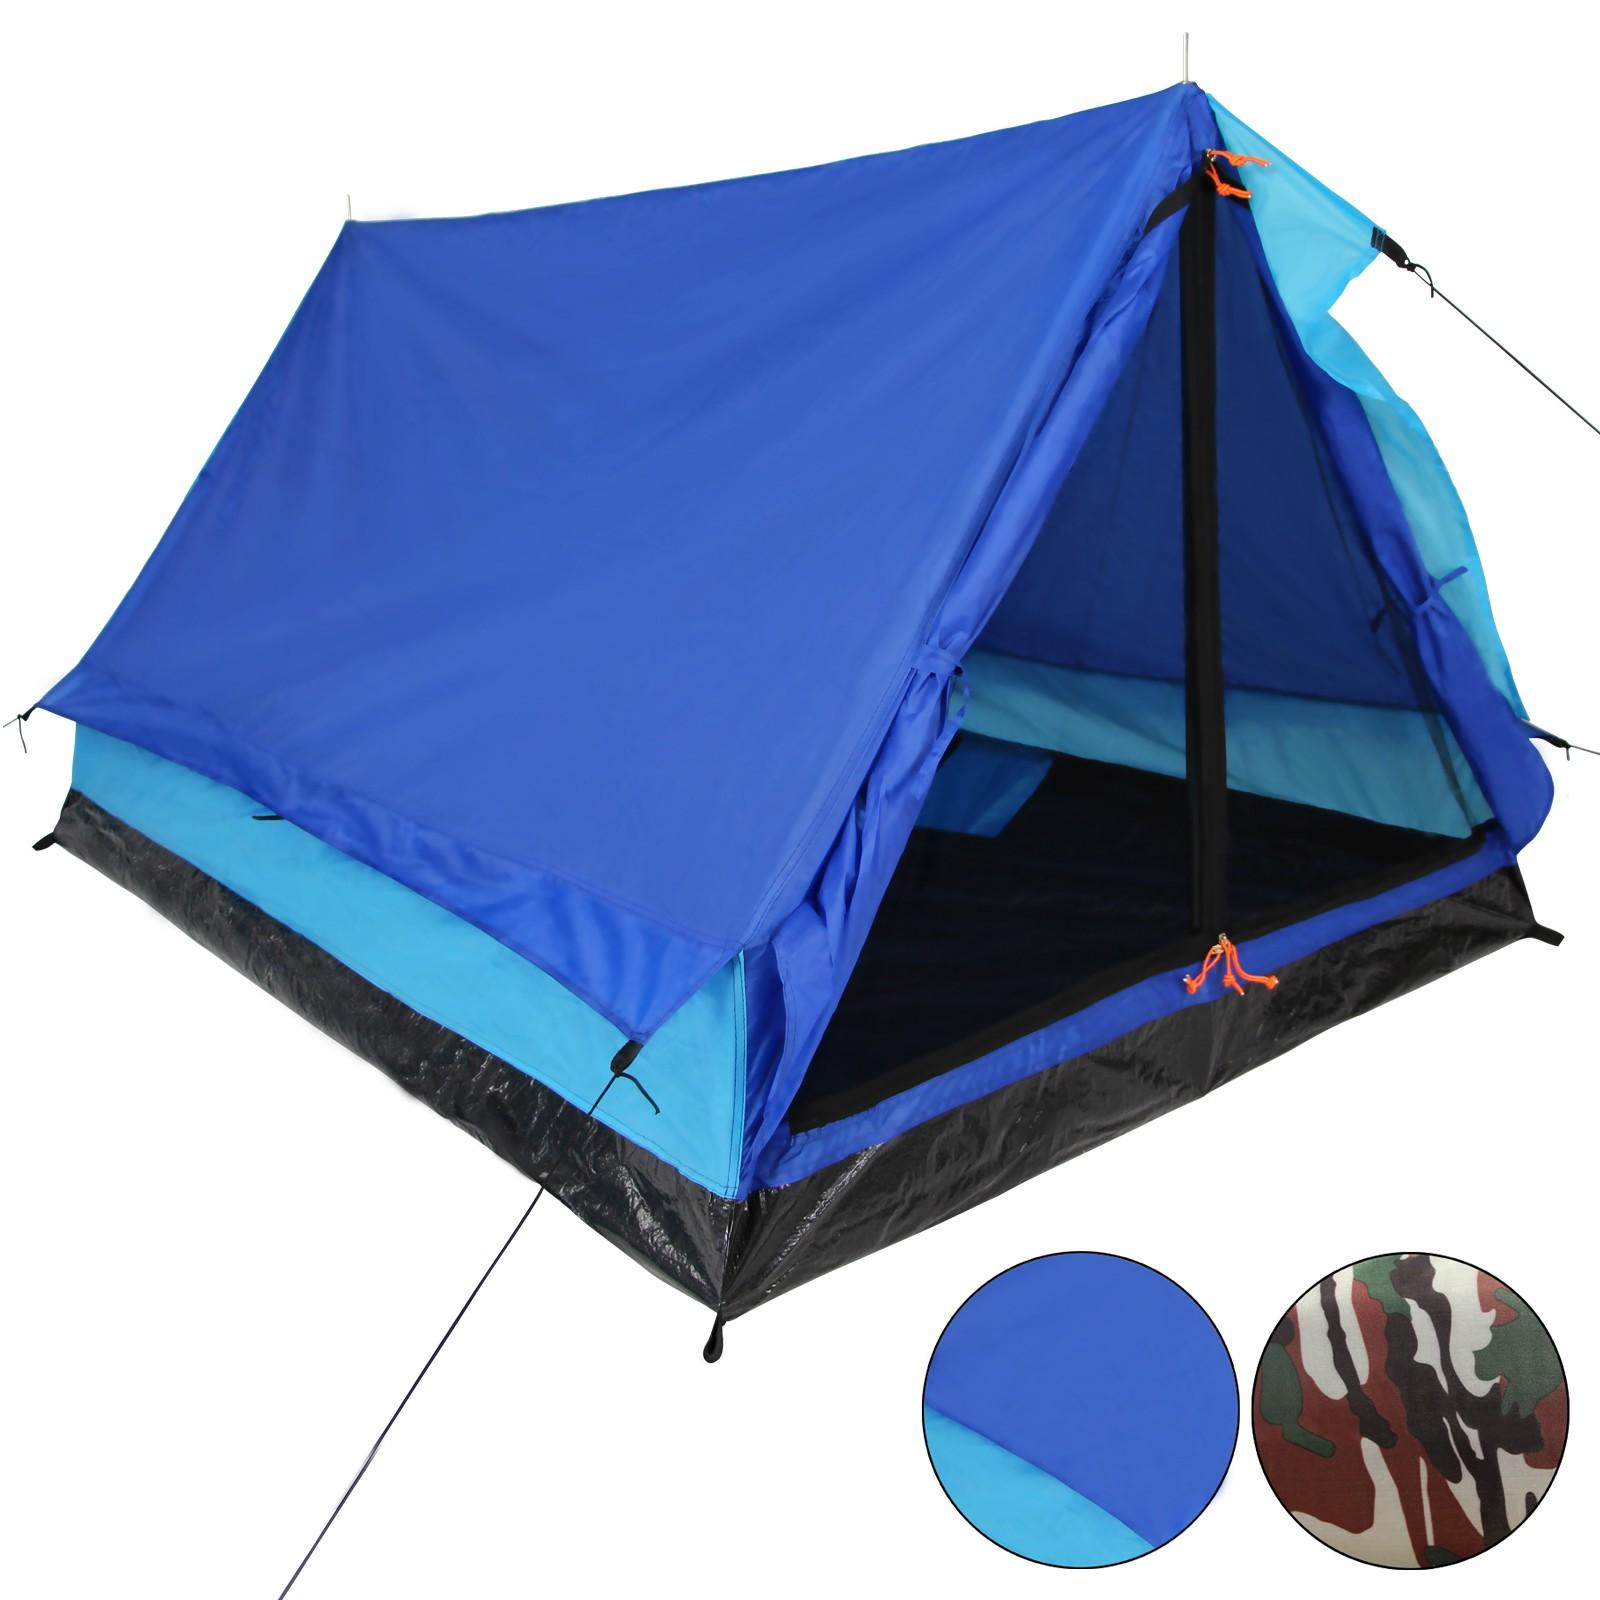 Item specifics  sc 1 st  eBay & 2 man Ridge Tent SKAGERU Camping Trekking Hiking Festival Kids by ...